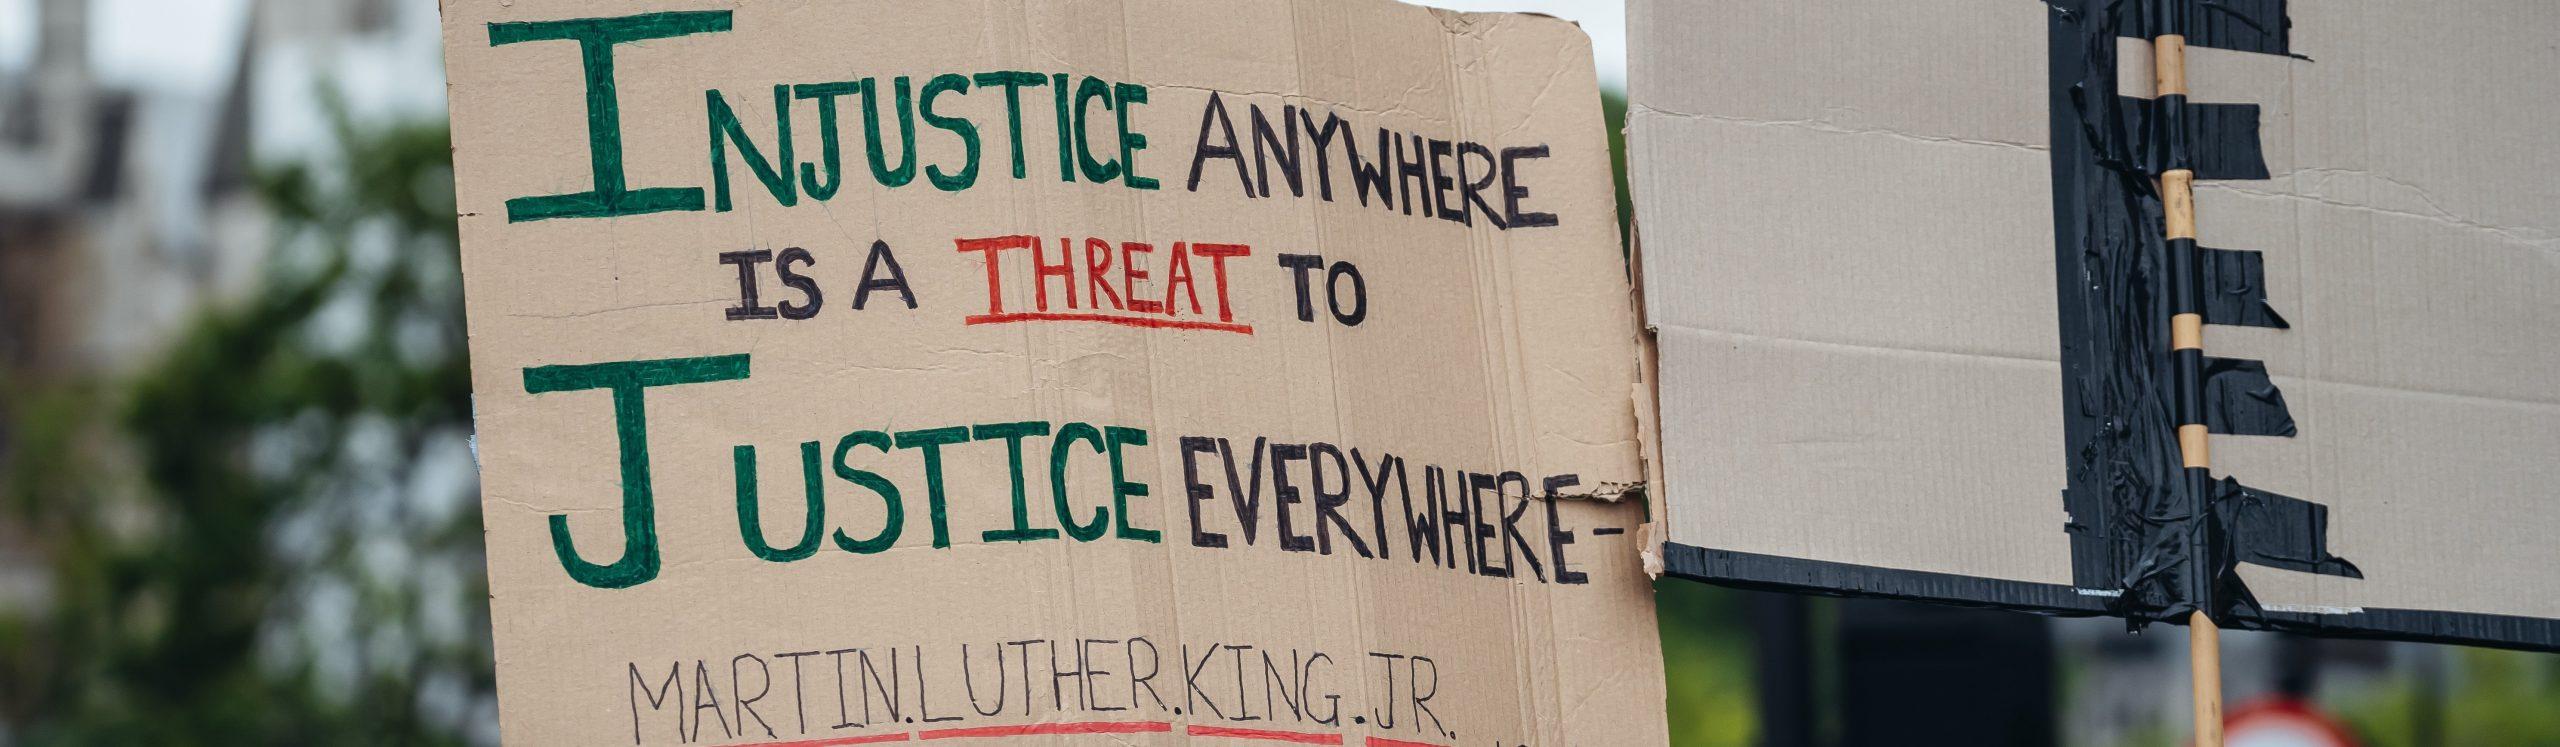 London / UK - 06/06/2020: Black Lives Matter protest during lockdown coronavirus pandemic. Injustice Justice sign